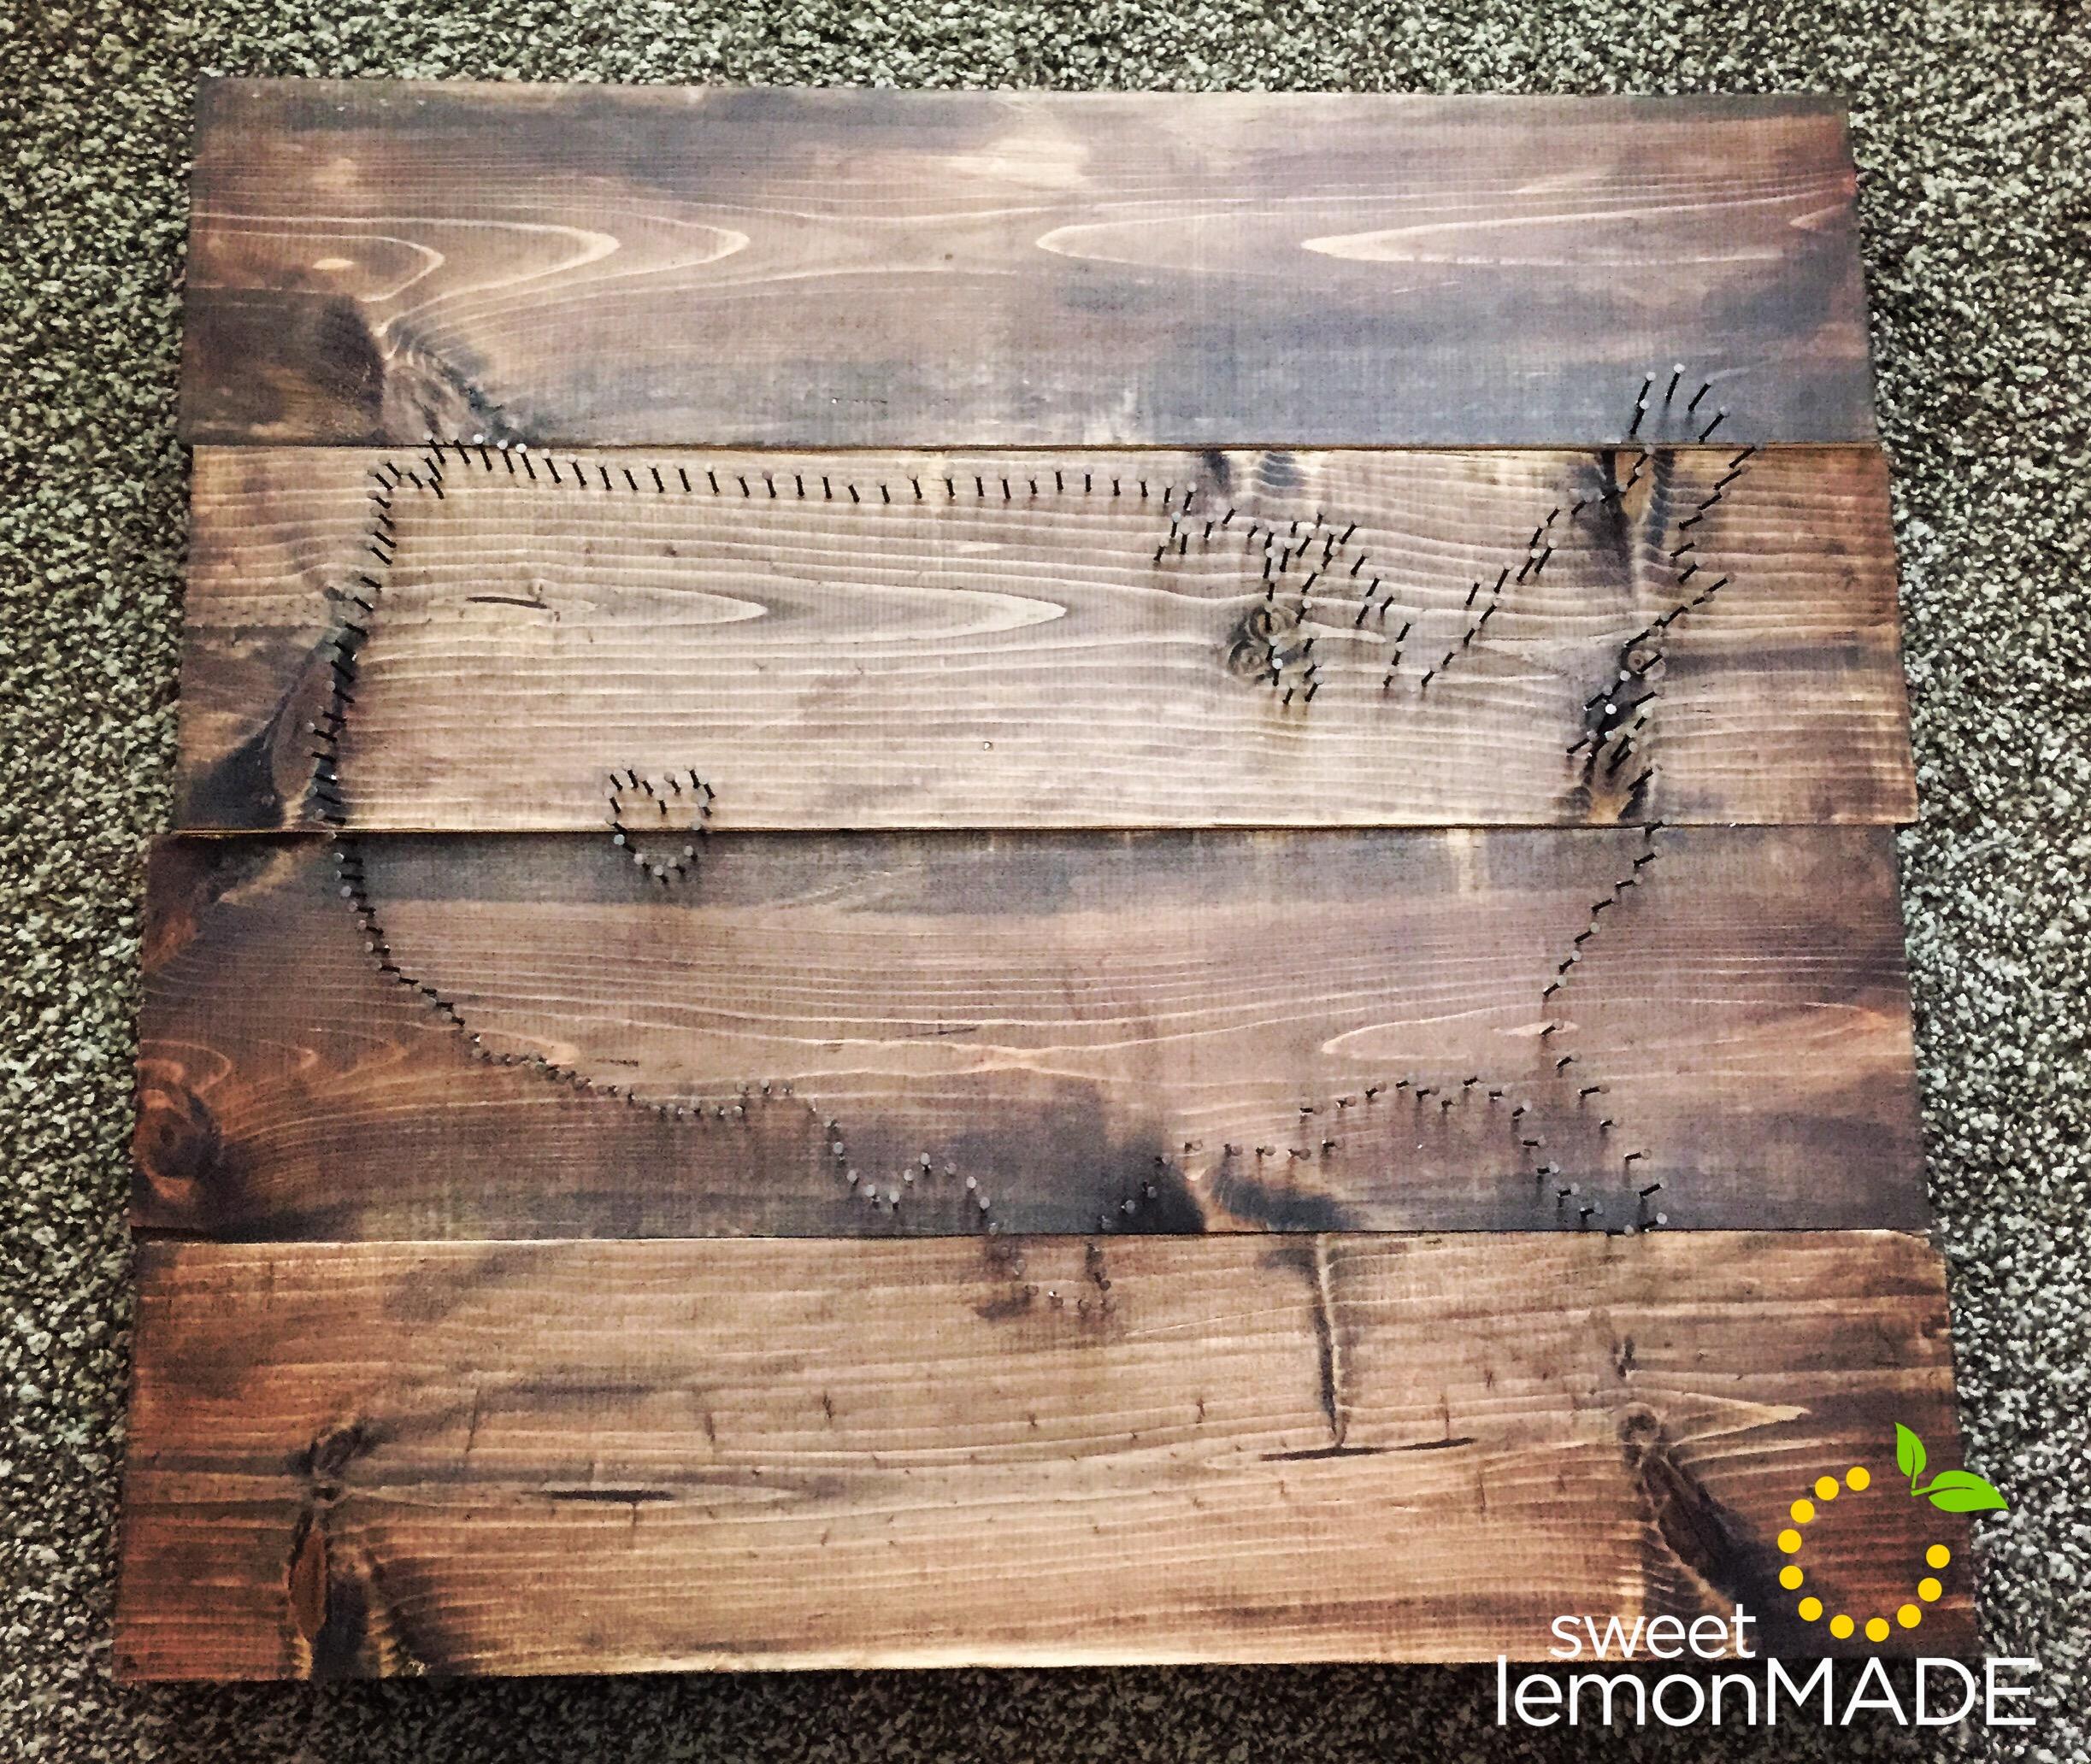 Board with Nails sweetlemonmade.com